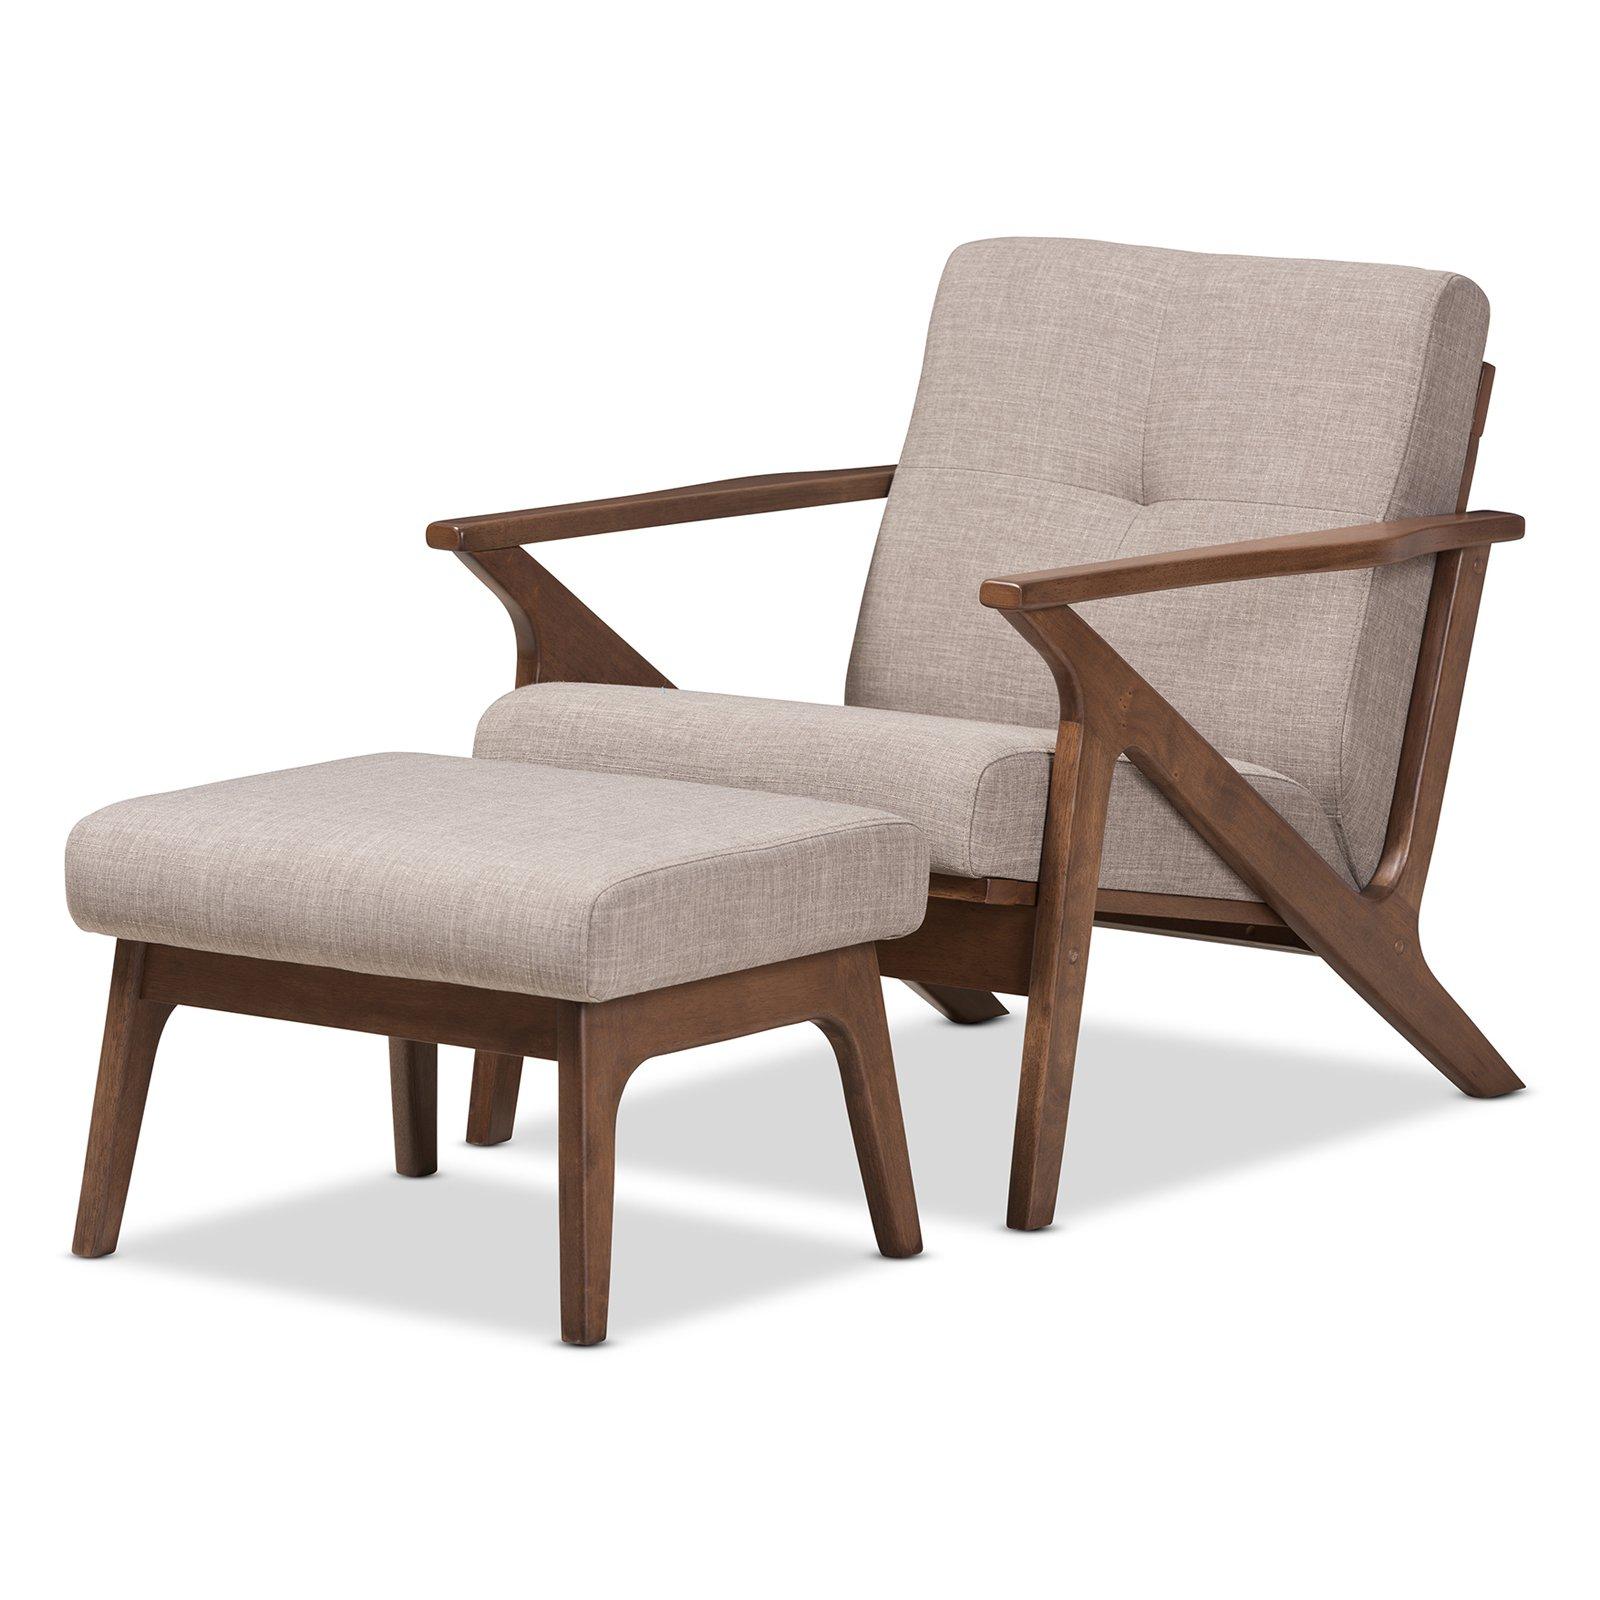 Baxton studio bianca mid century modern walnut wood light grey fabric tufted lounge chair and ottoman set walmart com